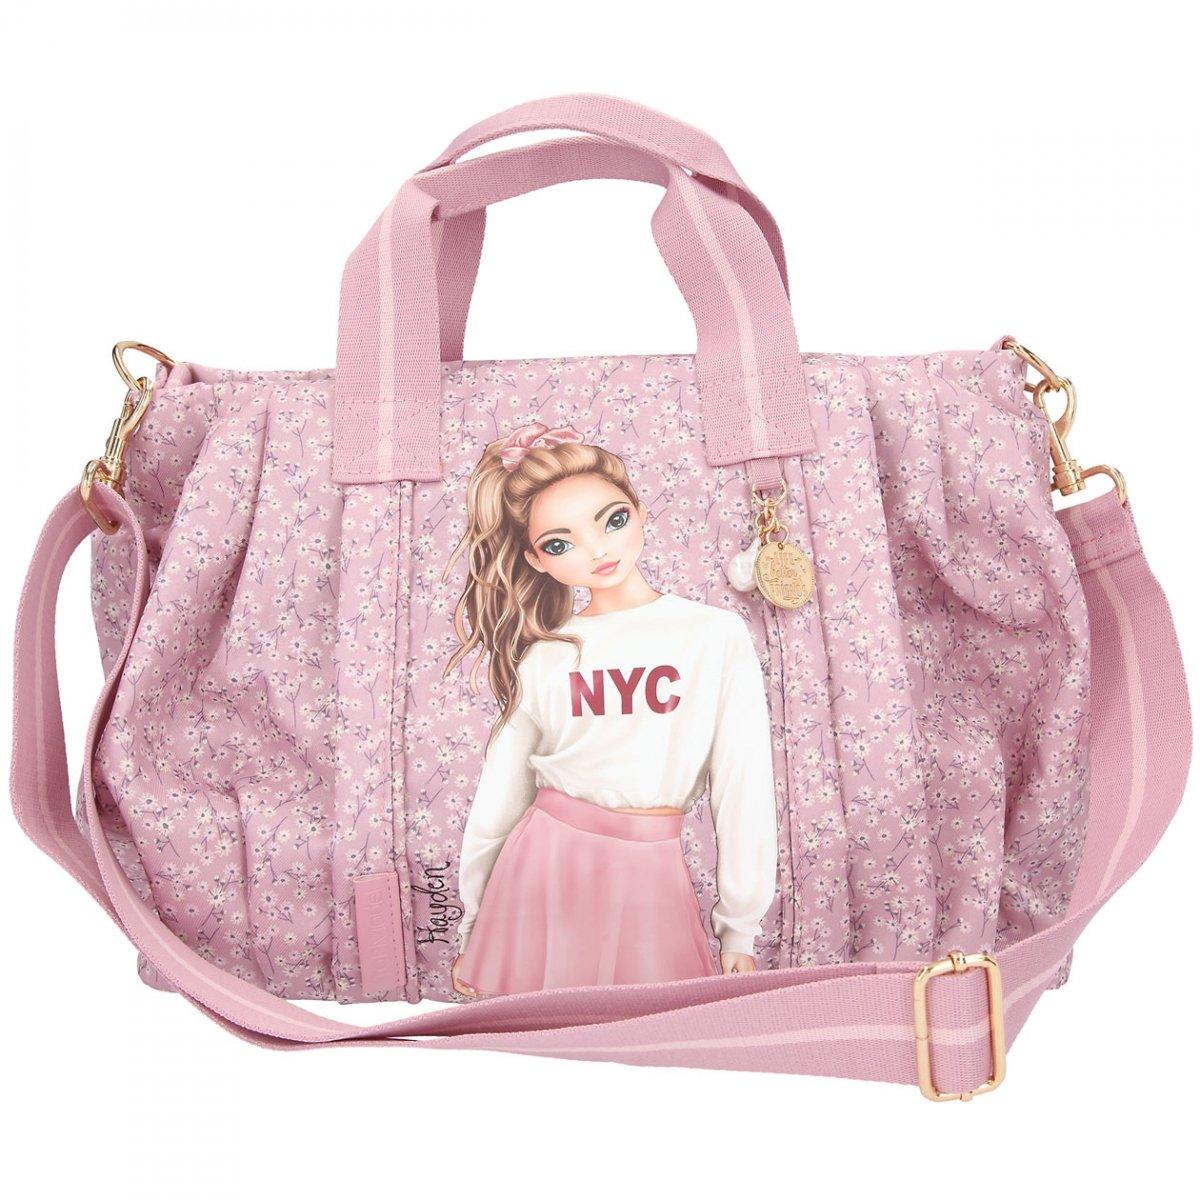 Top Model - Sportsbag - City Flowers (0411199)